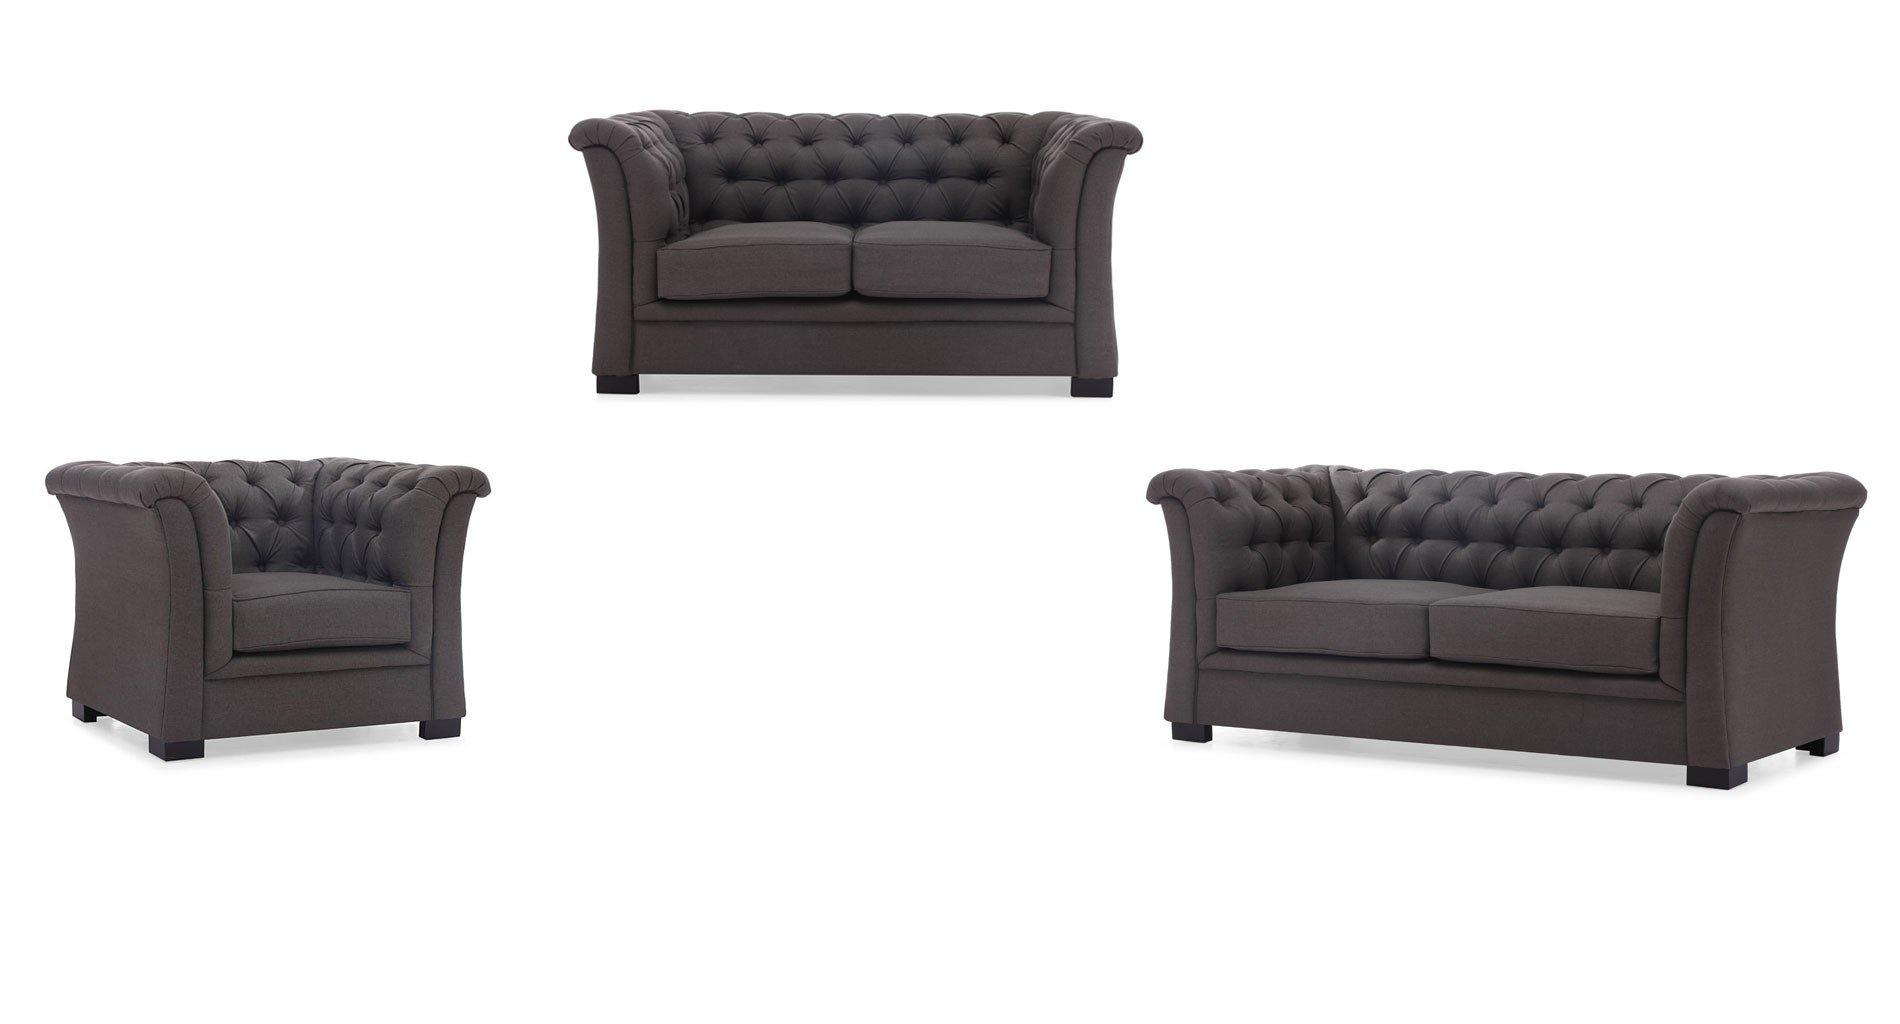 Nob Hill Living Room Set (Charcoal Gray) Zuo Modern   Furniture Cart